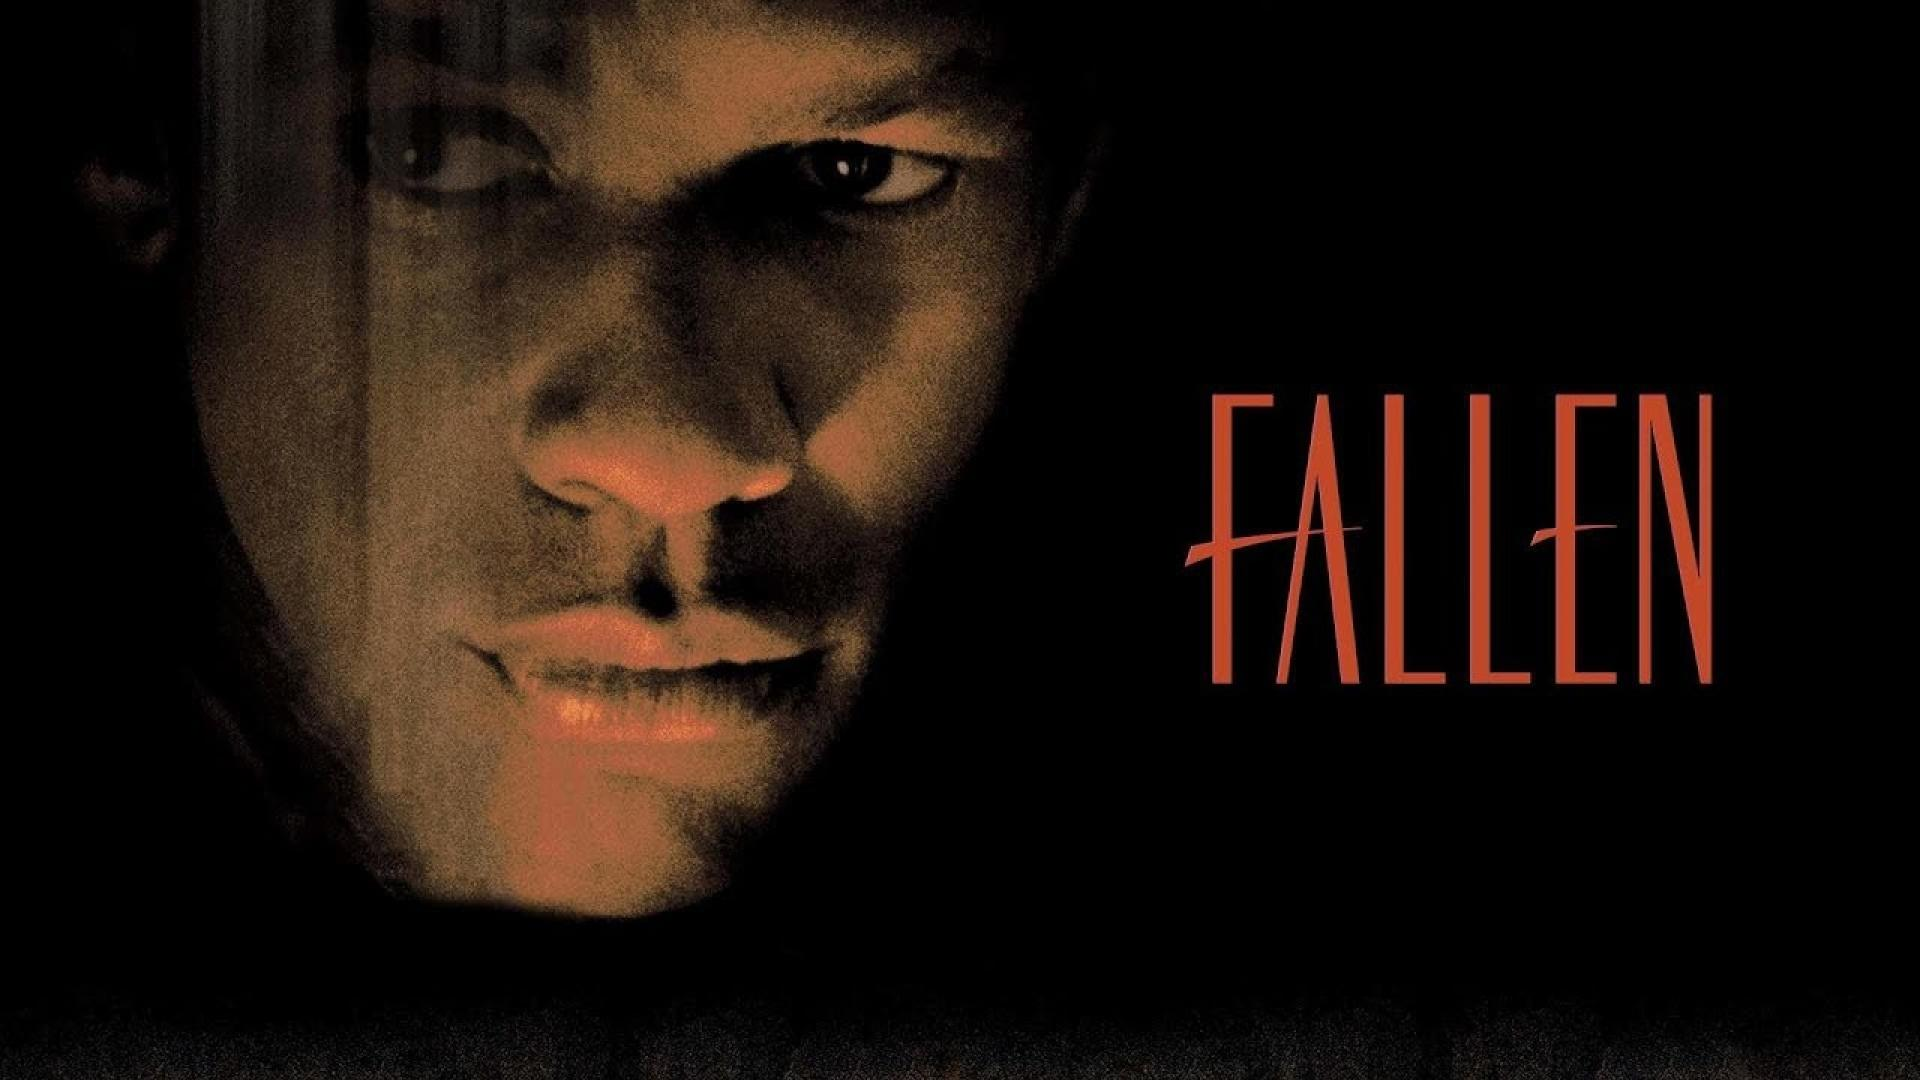 Fallen - Letaszítva (1998)